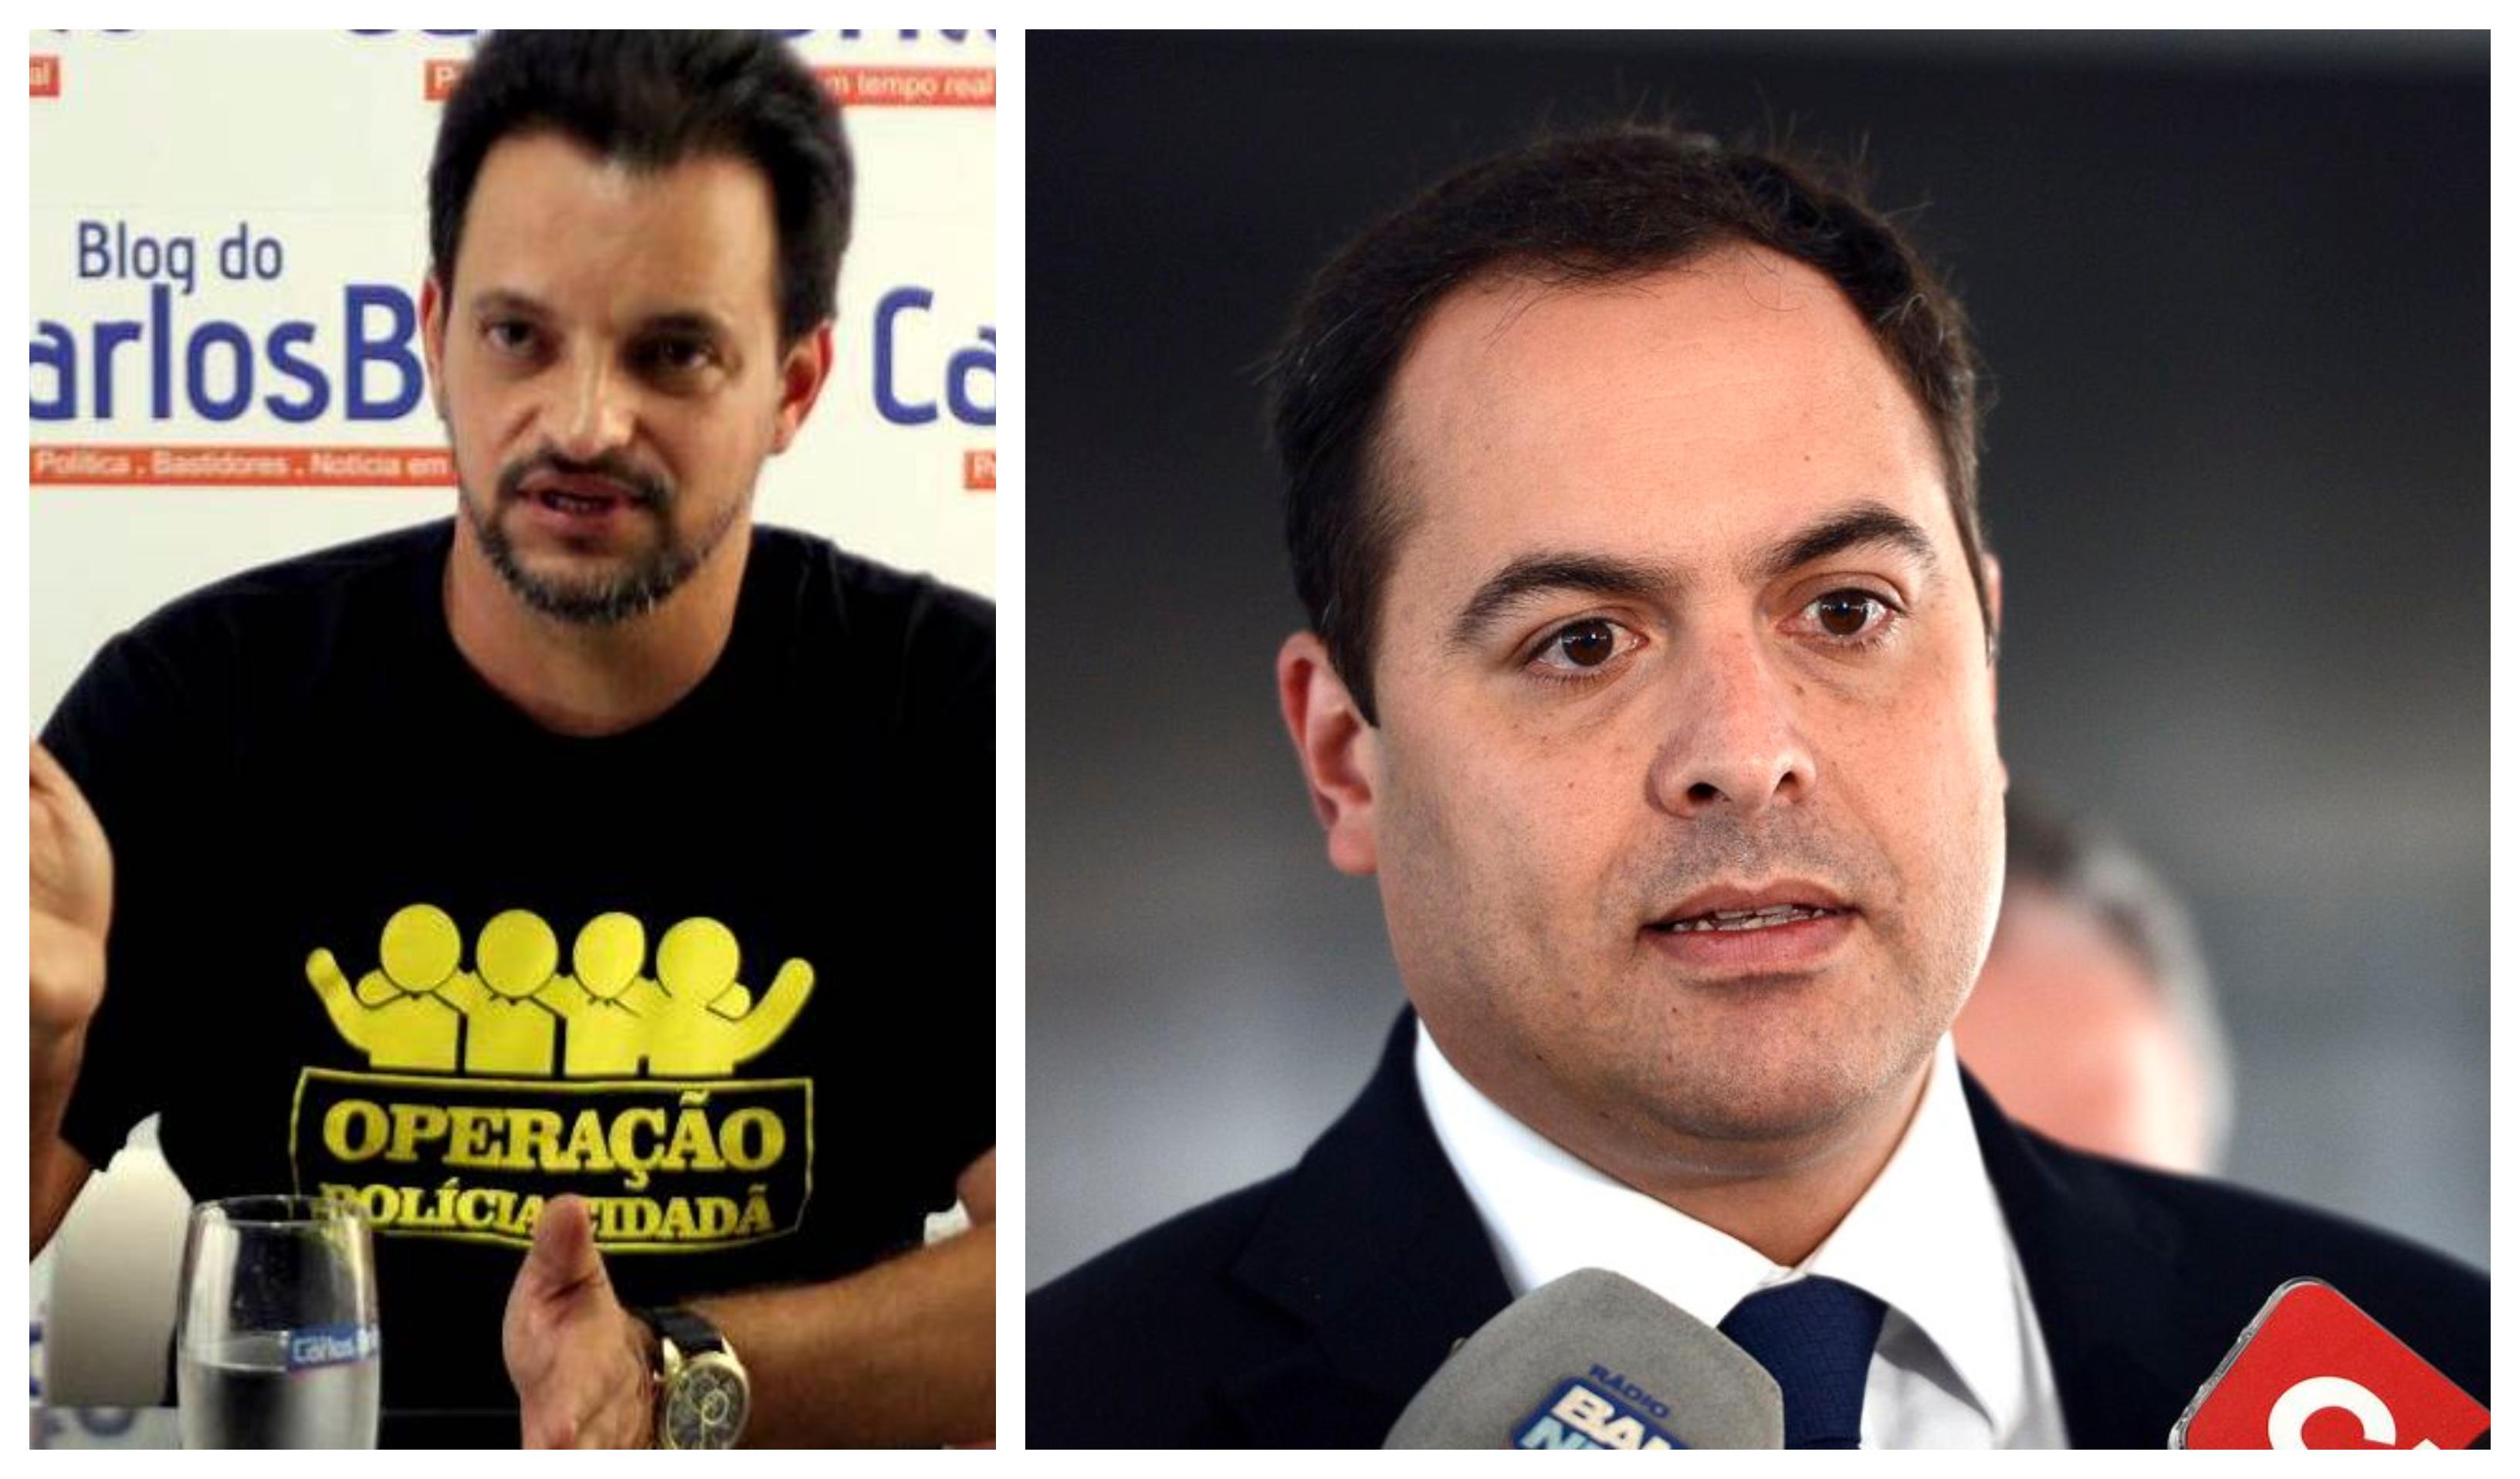 Damasceno: Governador de Pernambuco usa lei da ditadura para demitir policial antifascista que preside sindicato da categoria